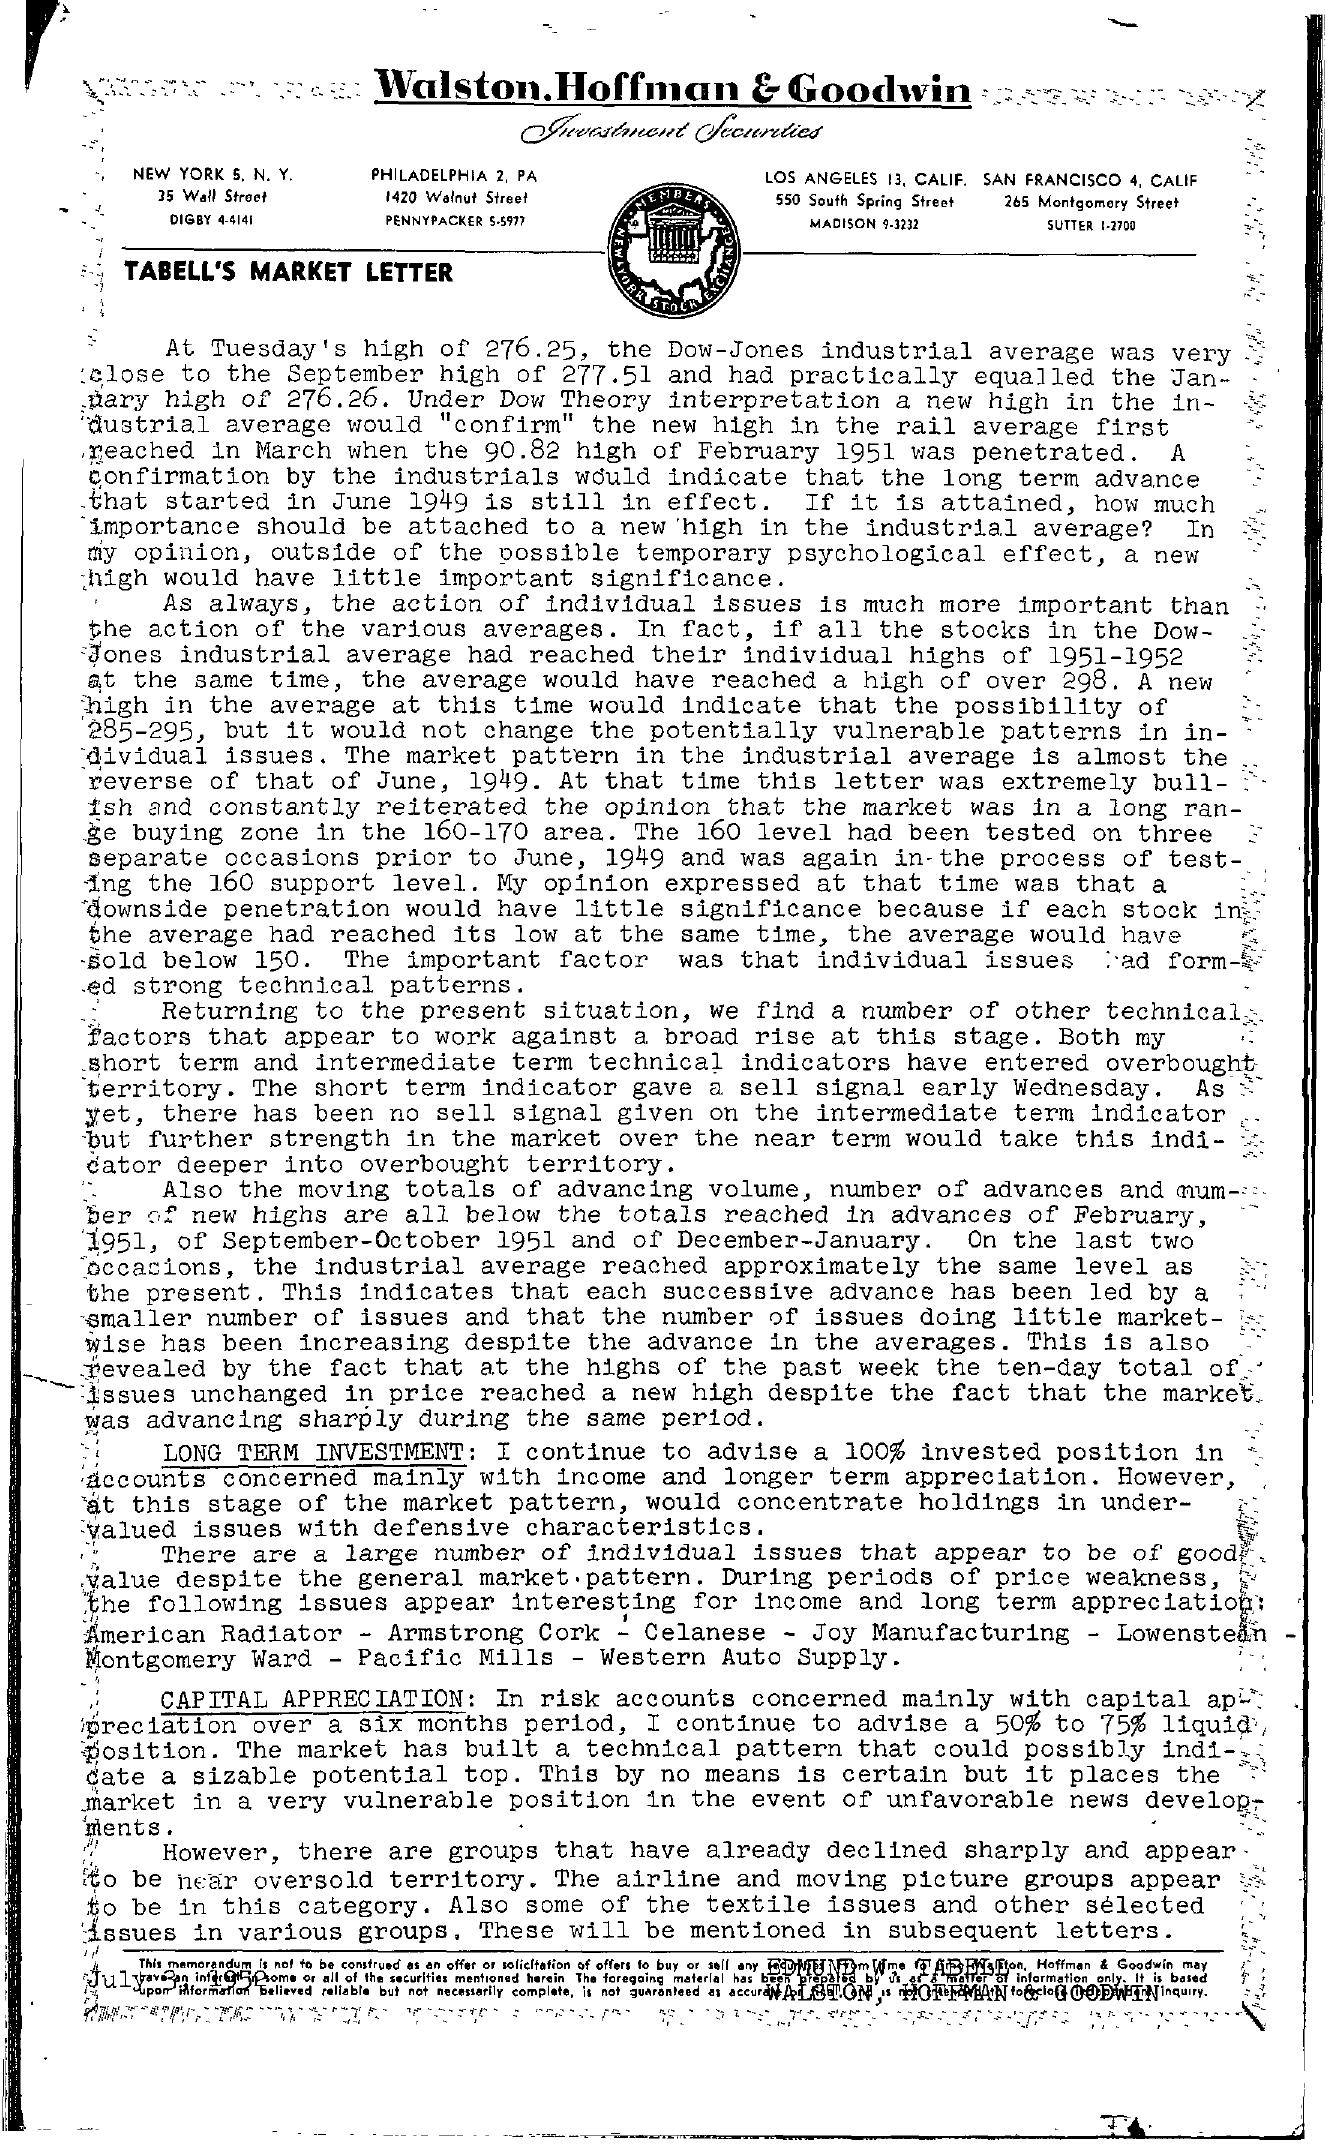 Tabell's Market Letter - July 03, 1952